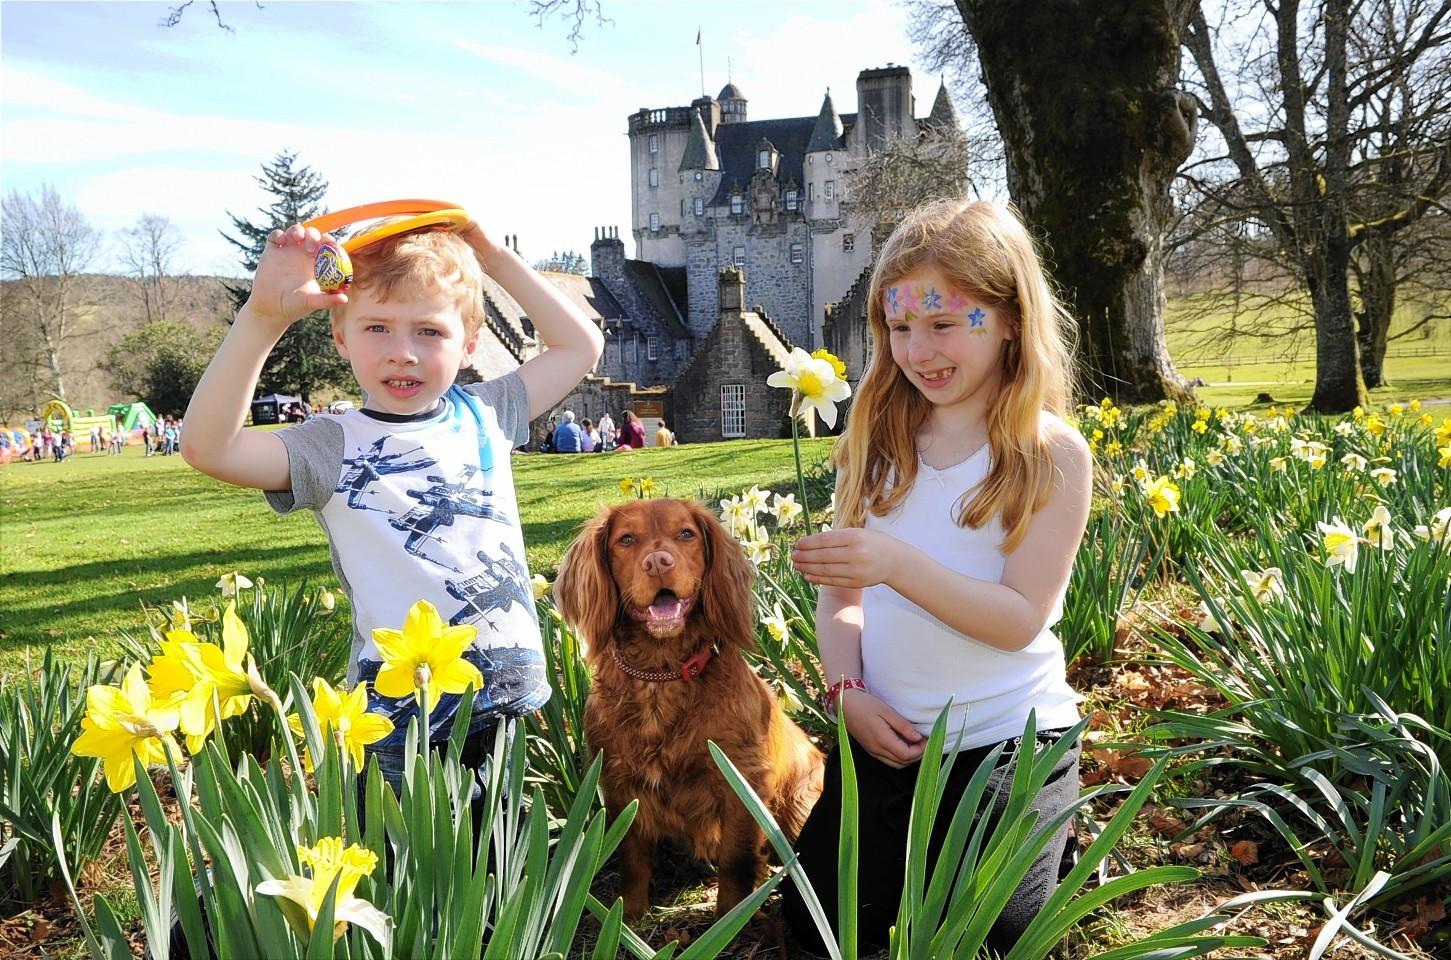 Zack and Sophie Williams enjoying the fine weather at the Castle Fraser Easter Egg Hunt.